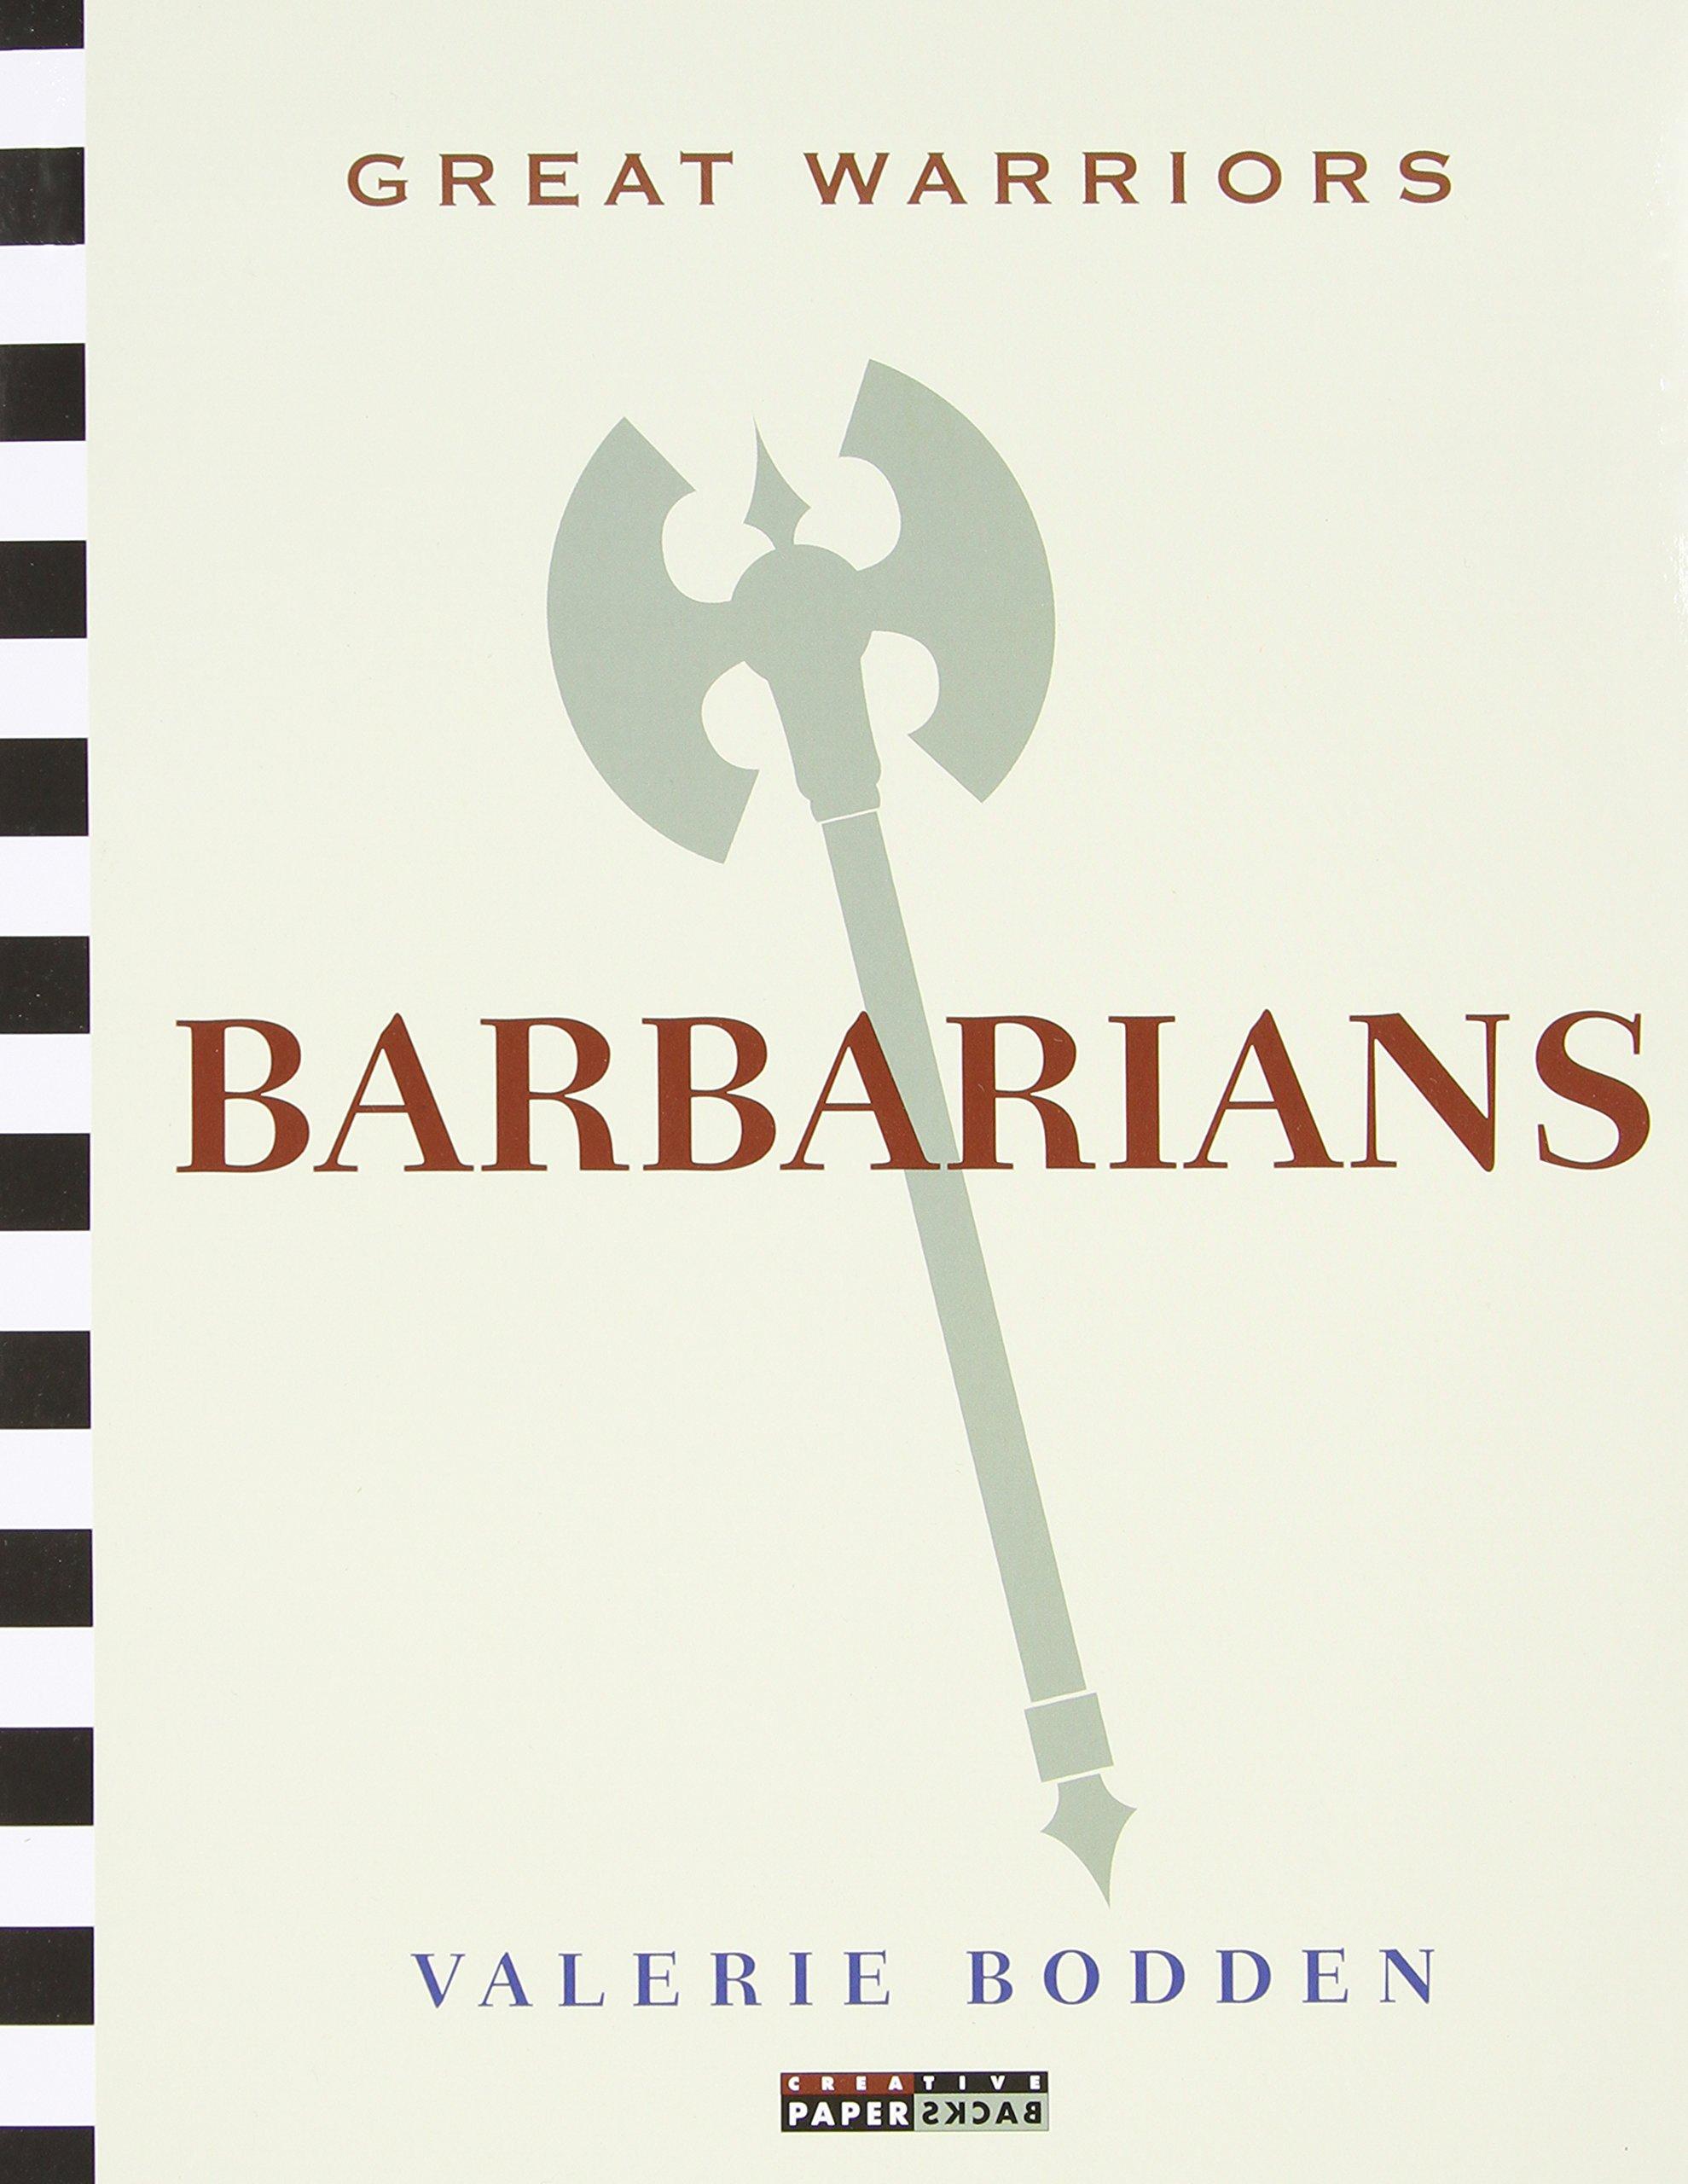 Great Warriors: Barbarians